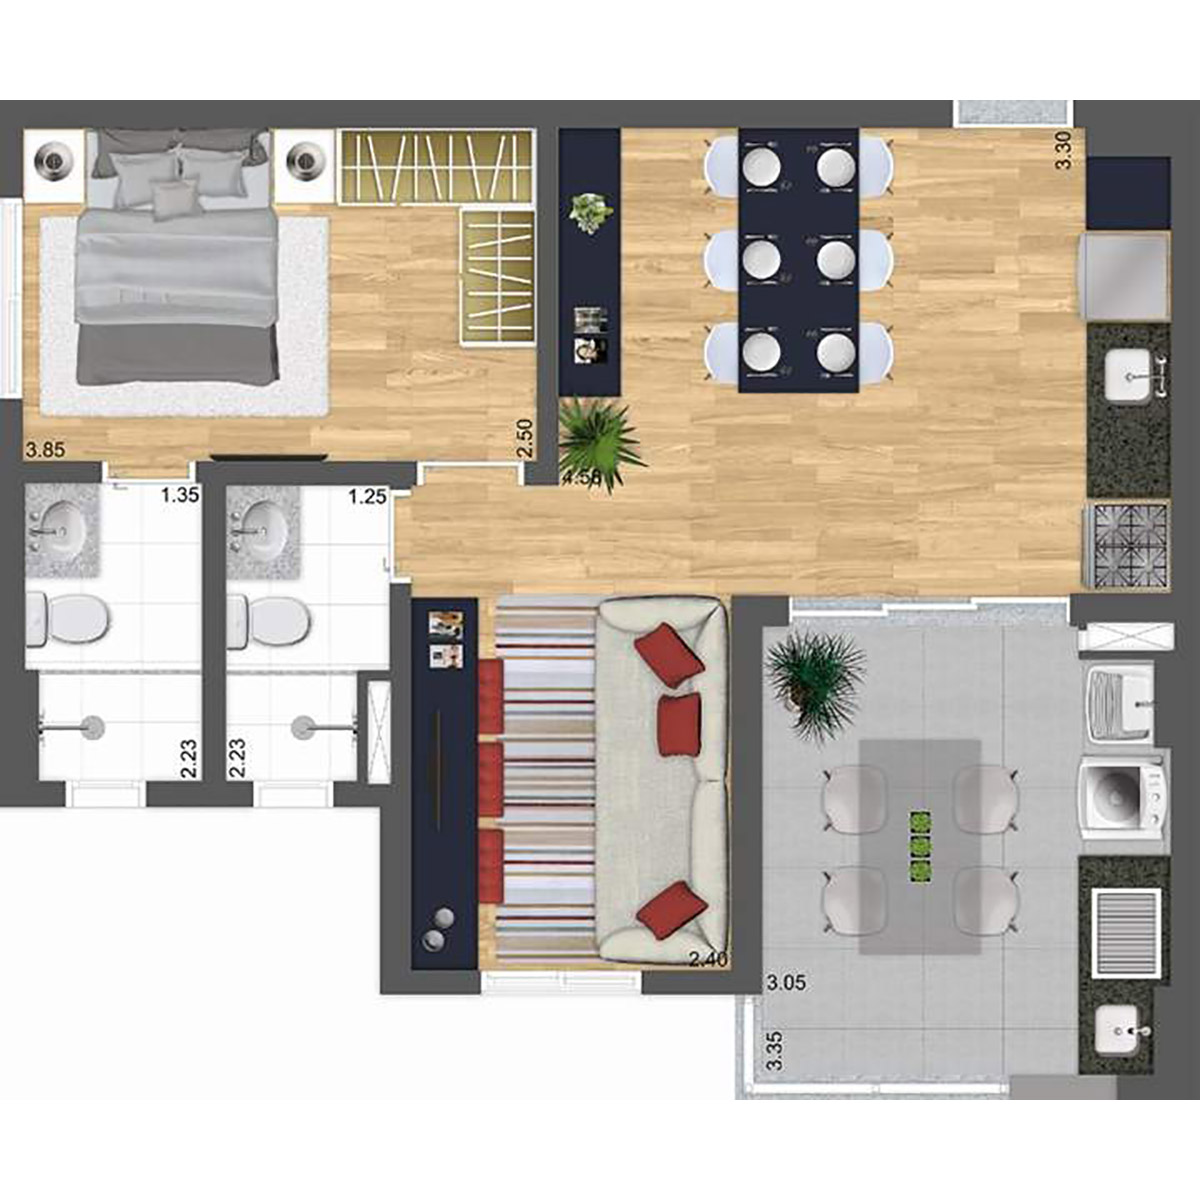 57 m² - Living Ampliado Parway Panamby